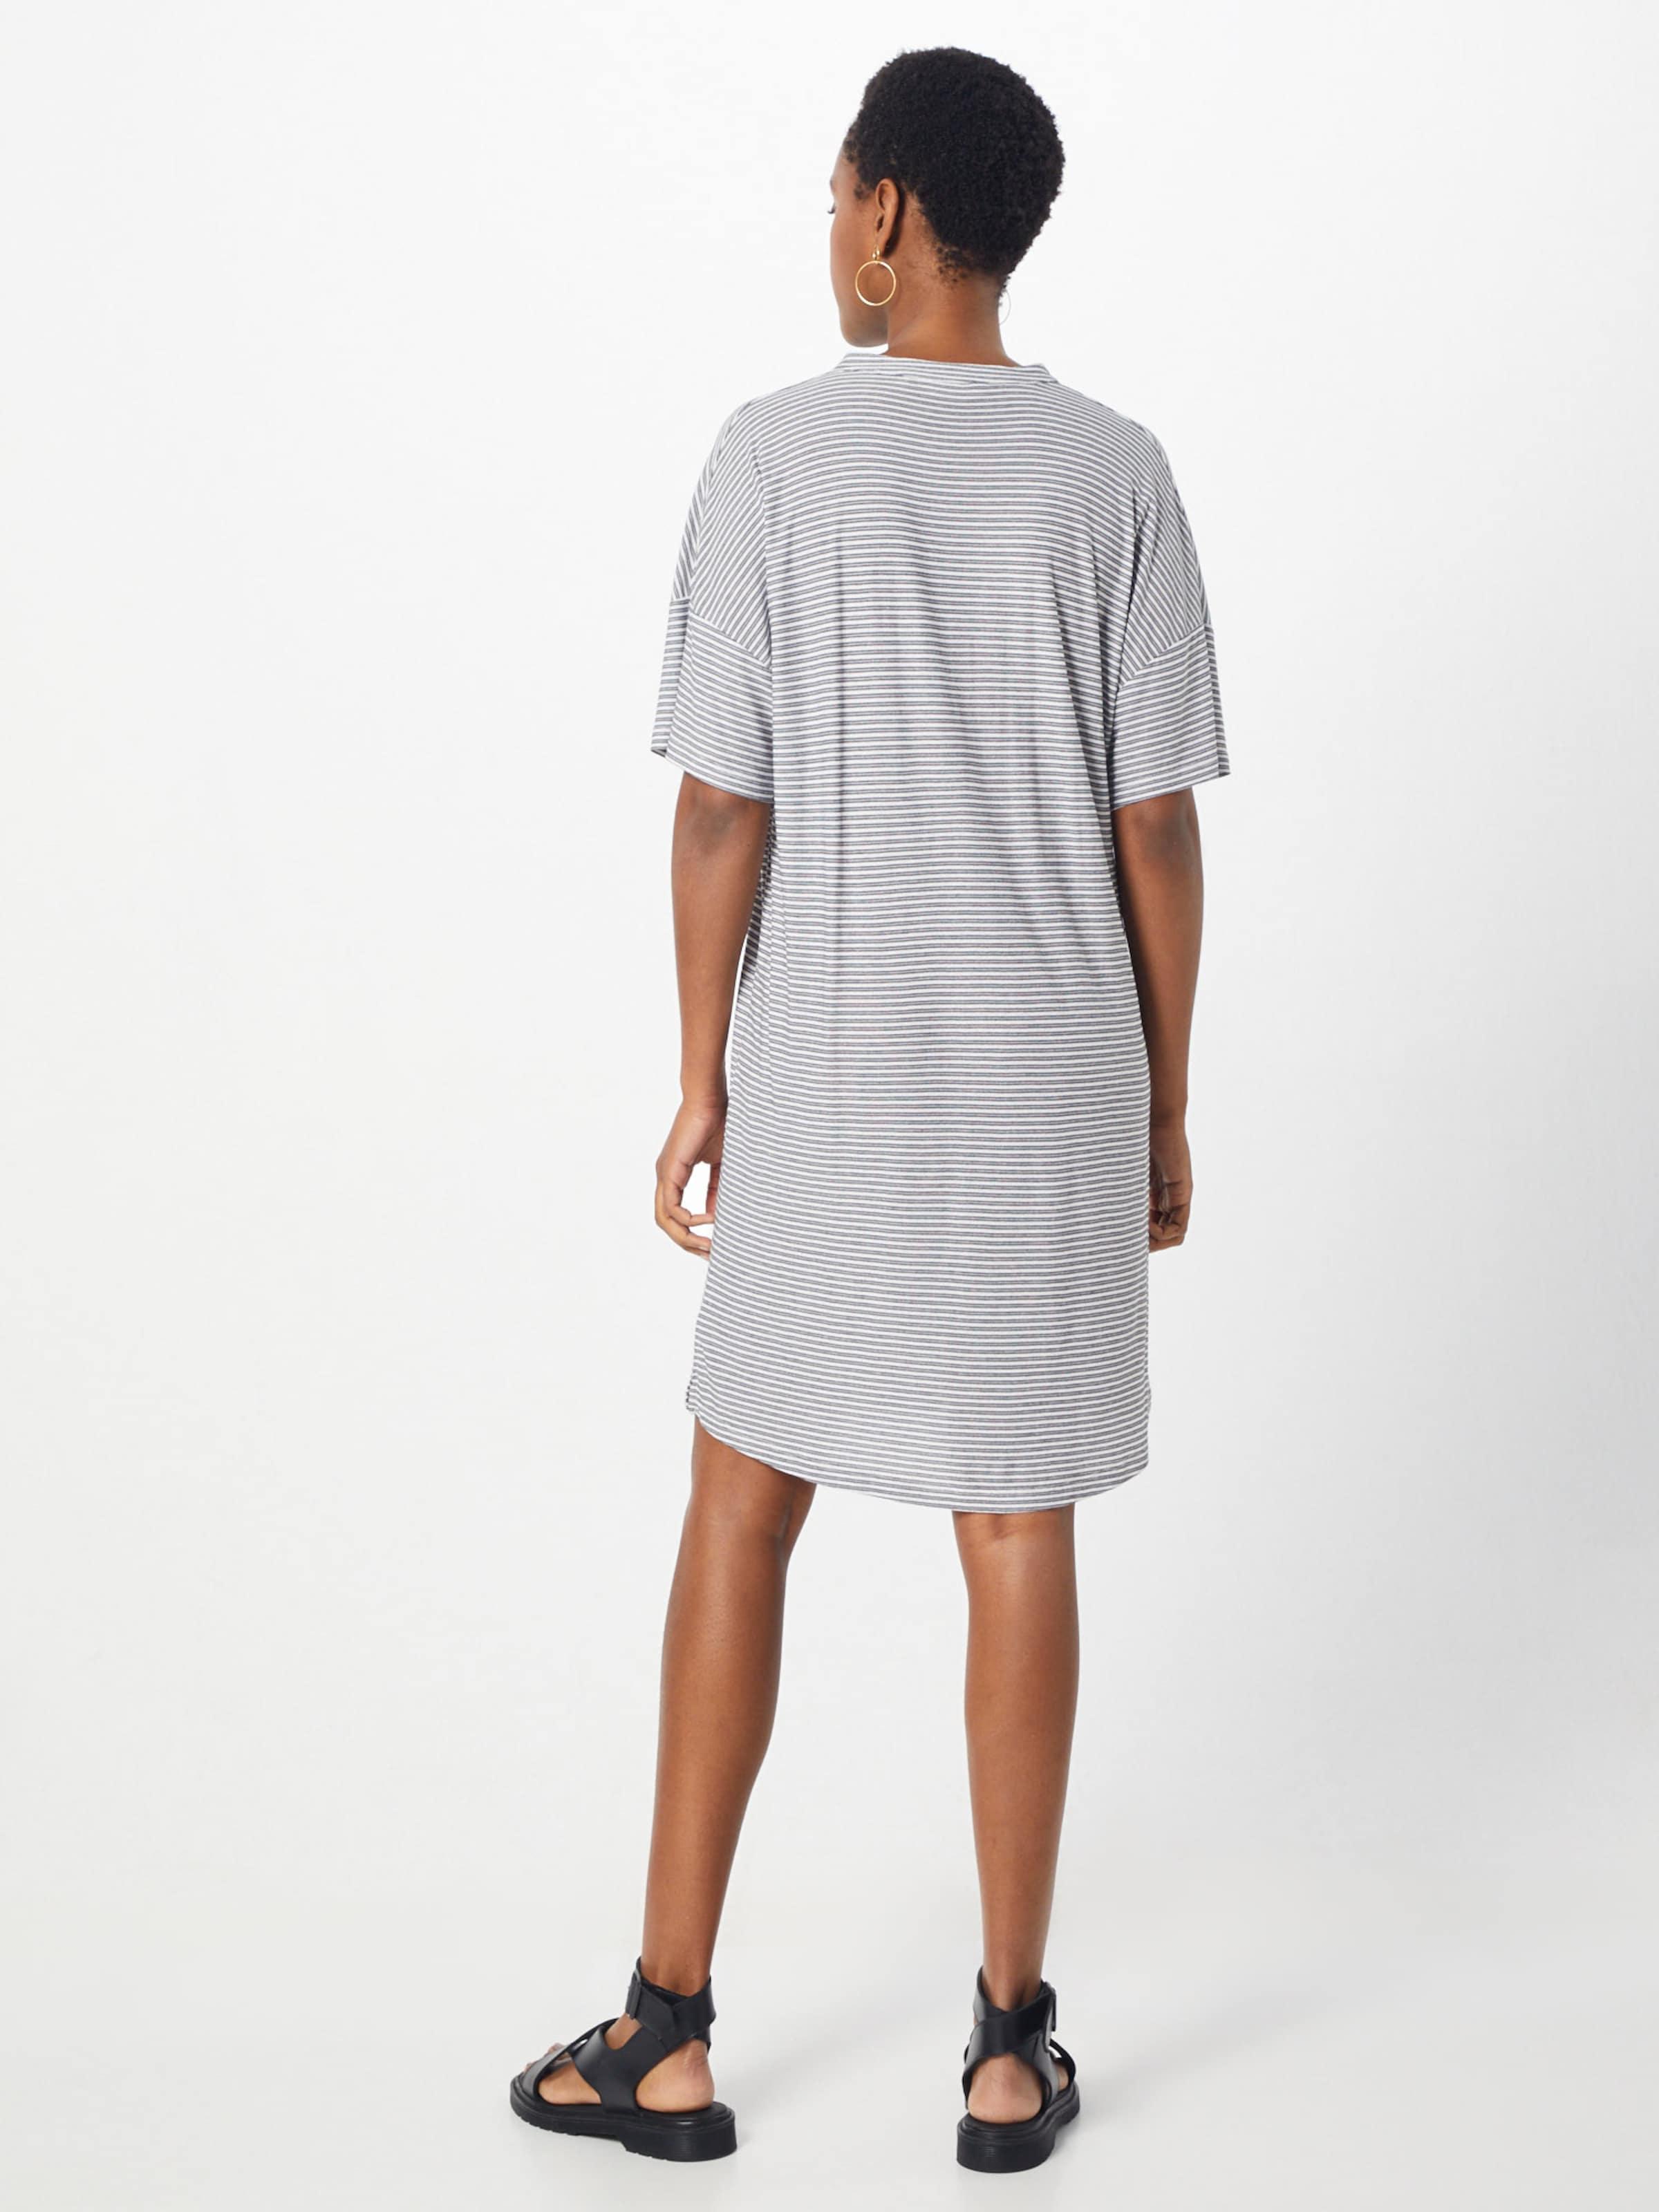 Basic Kleid SchwarzWeiß 'kristina' Apparel In L354RjqA